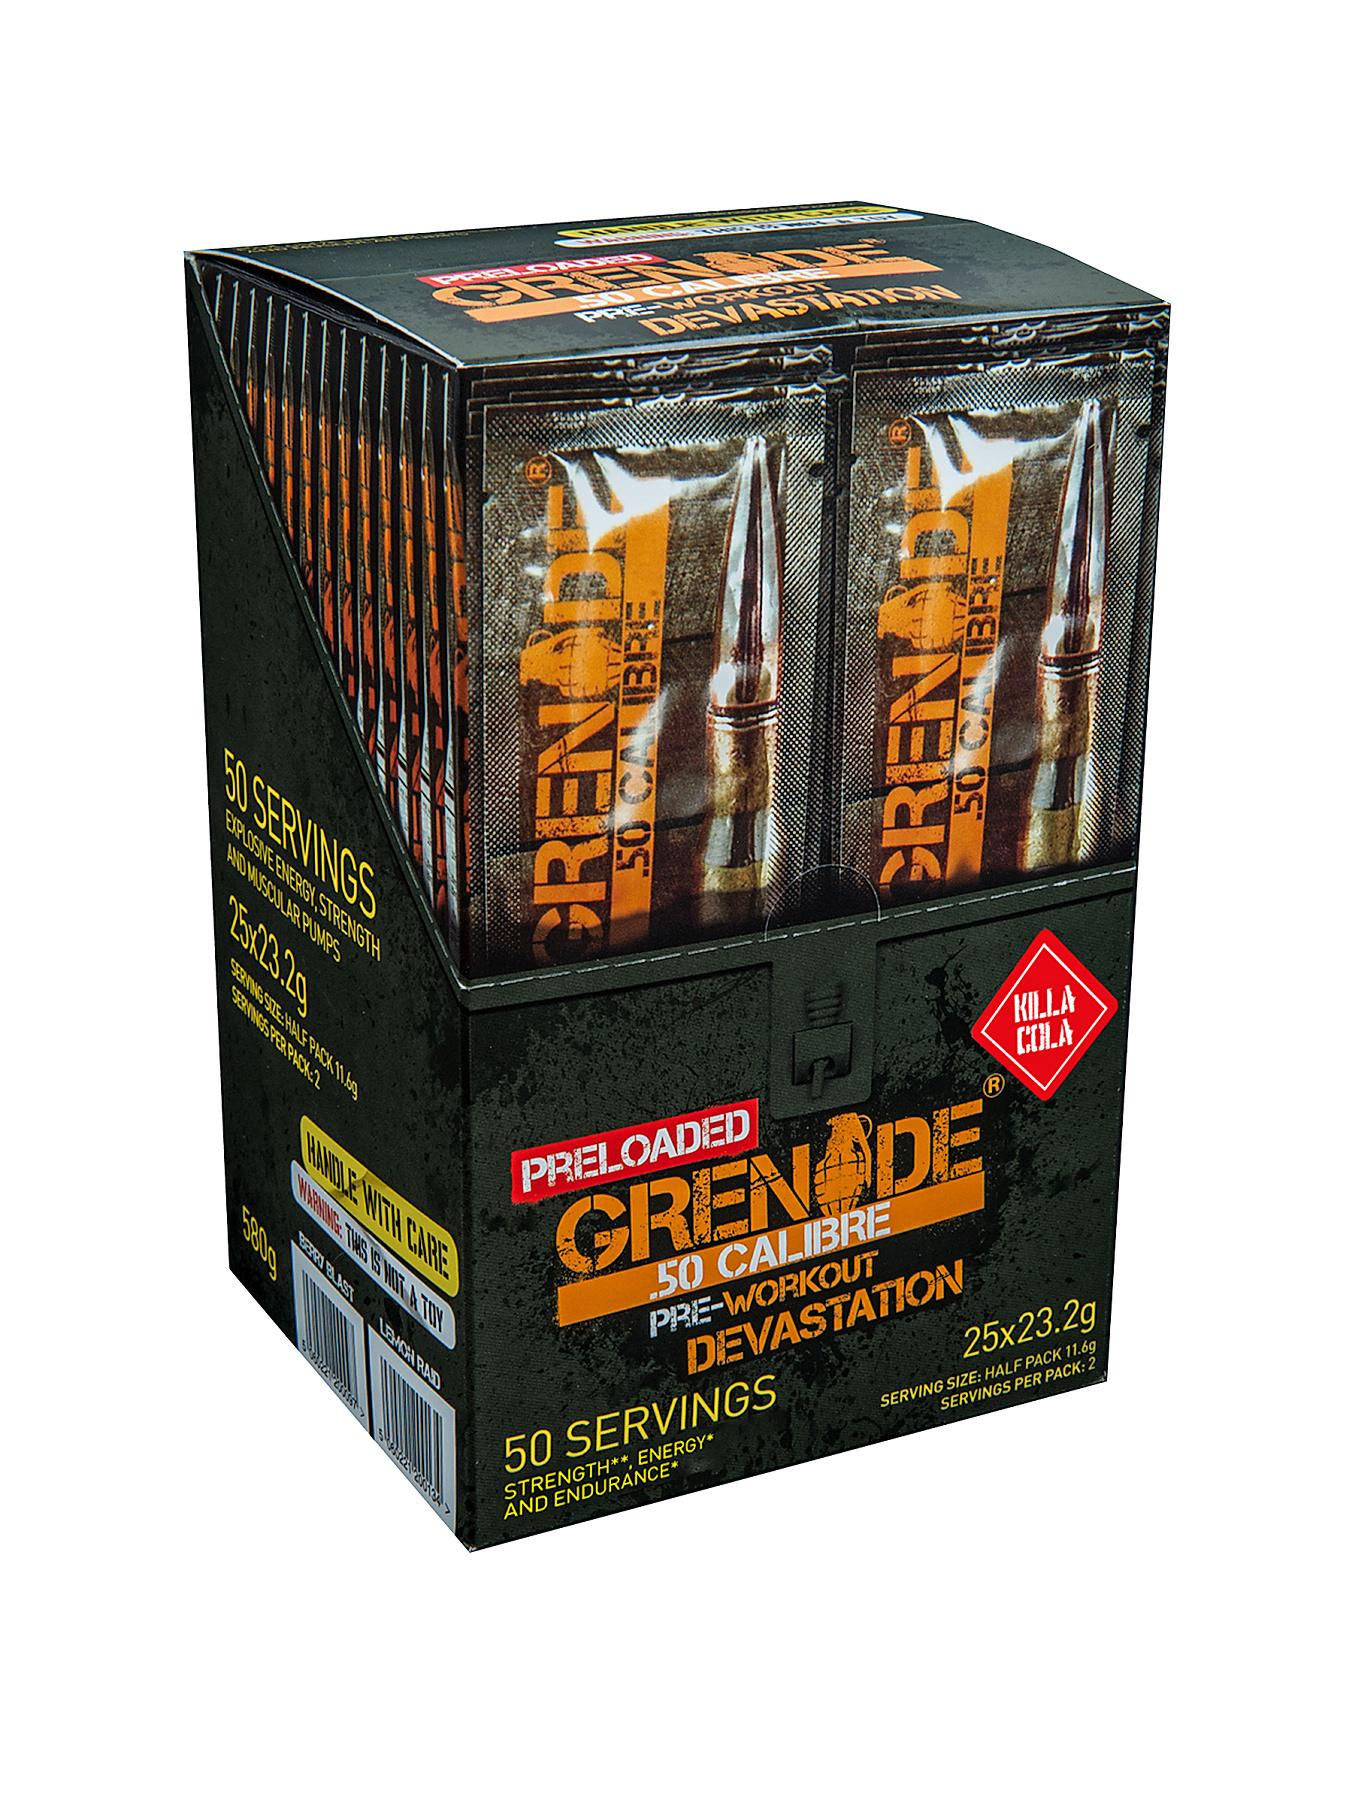 GRENADE 50. Calibre Pre Workout Energy Boost Powder 25 x 2 Serving Satchets - Killa Cola